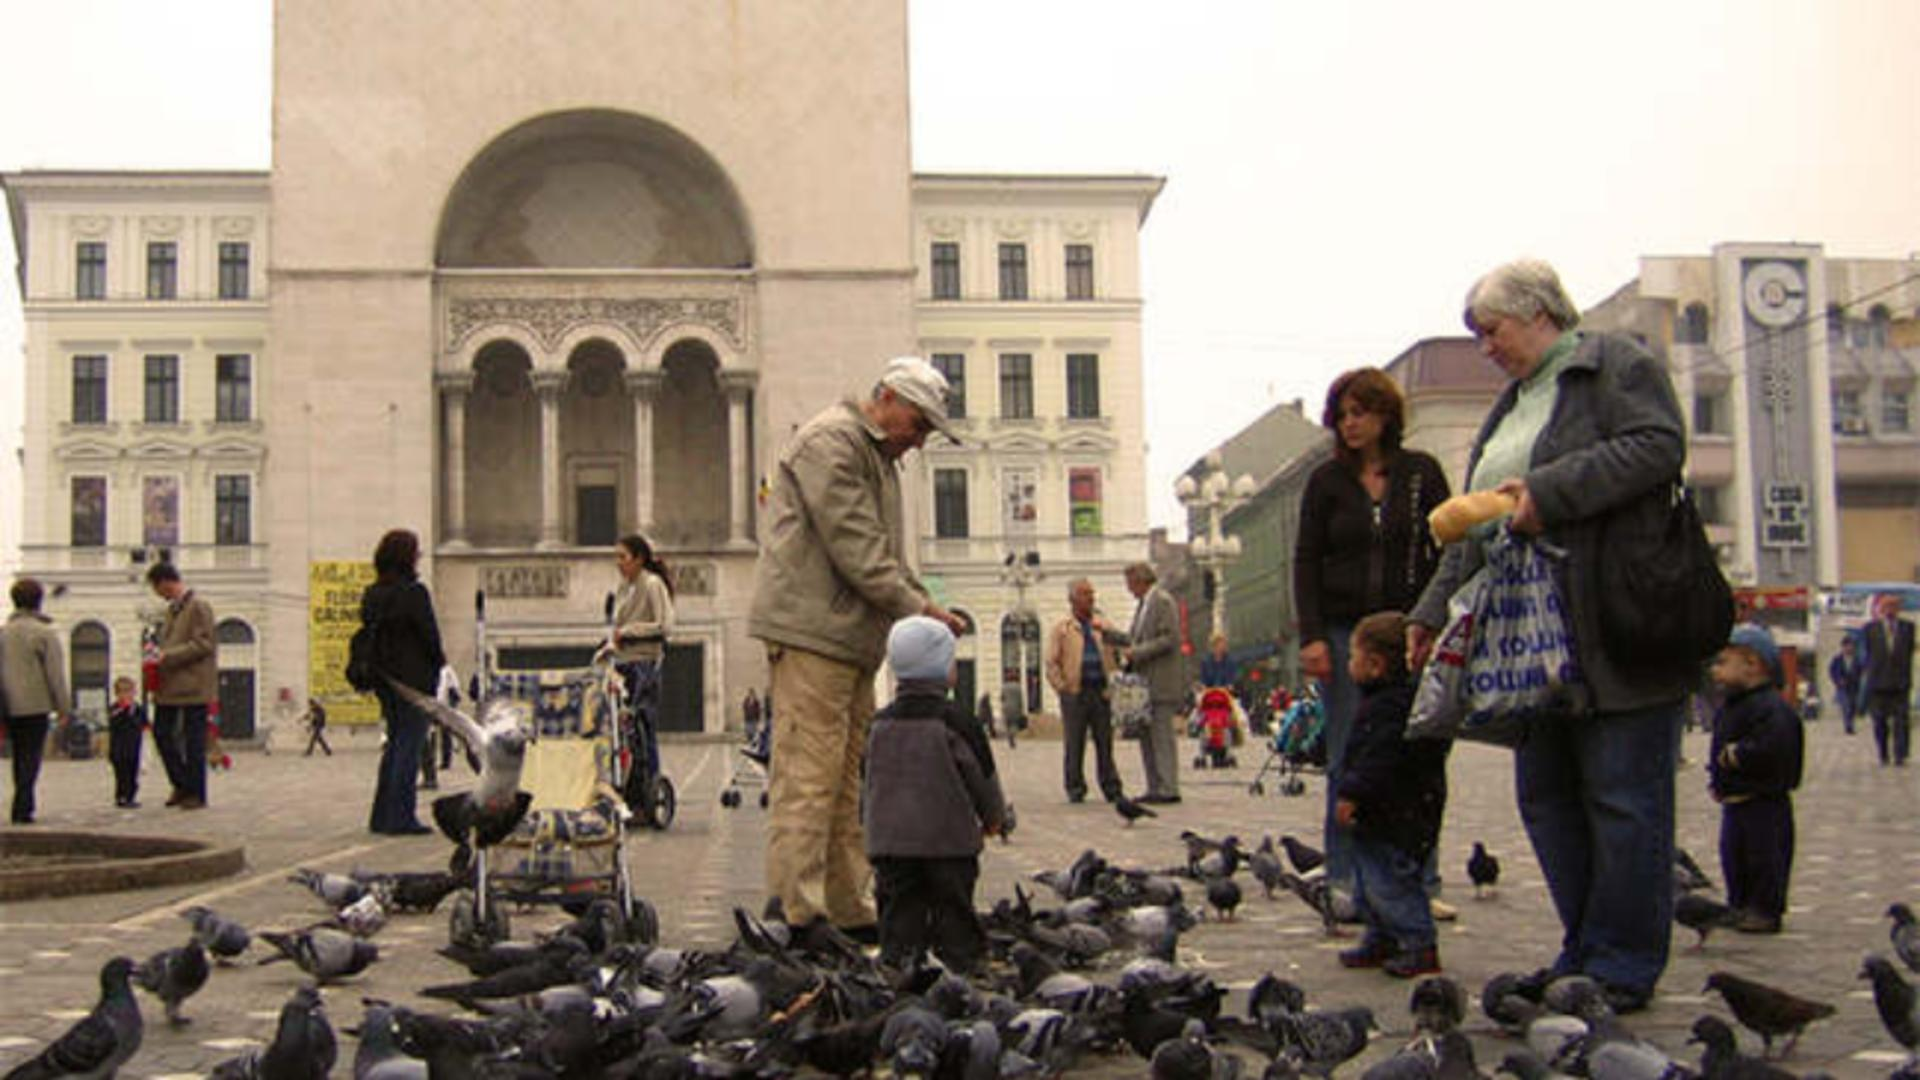 Porumbei in Piața Operei din Timișoara (foto: Primaria Timisoara)